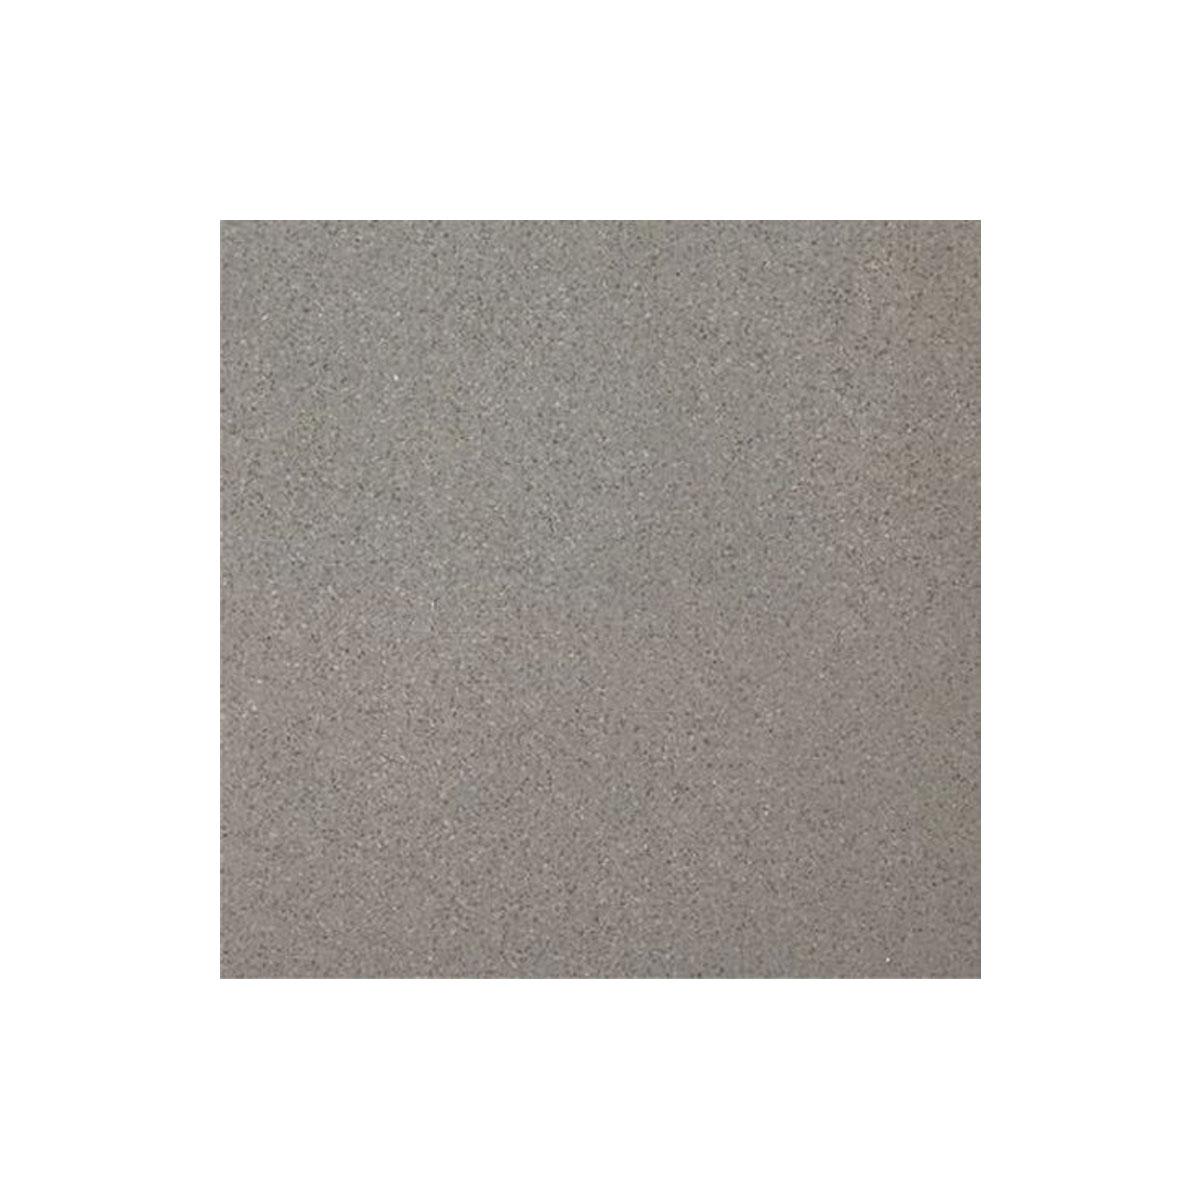 Patio -Light Grey - Commercial Range Tiles